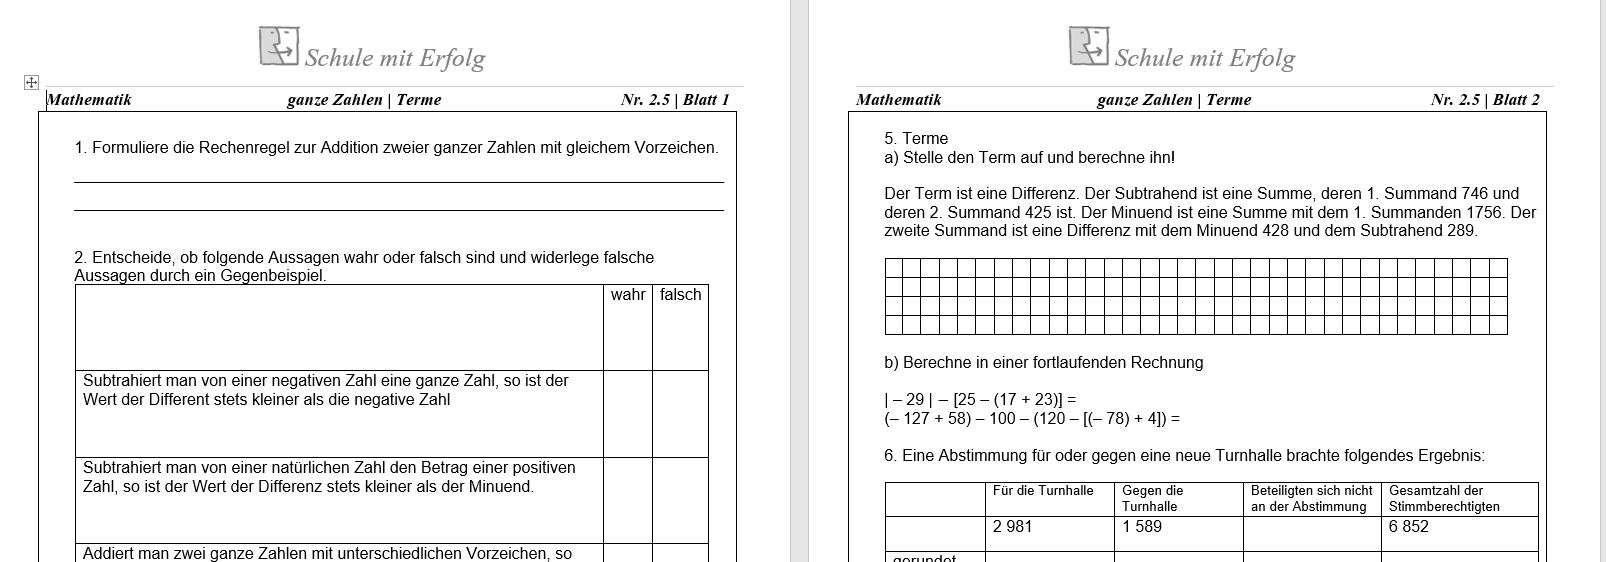 Schule mit erfolg Gymnasium mathematik 5klasse